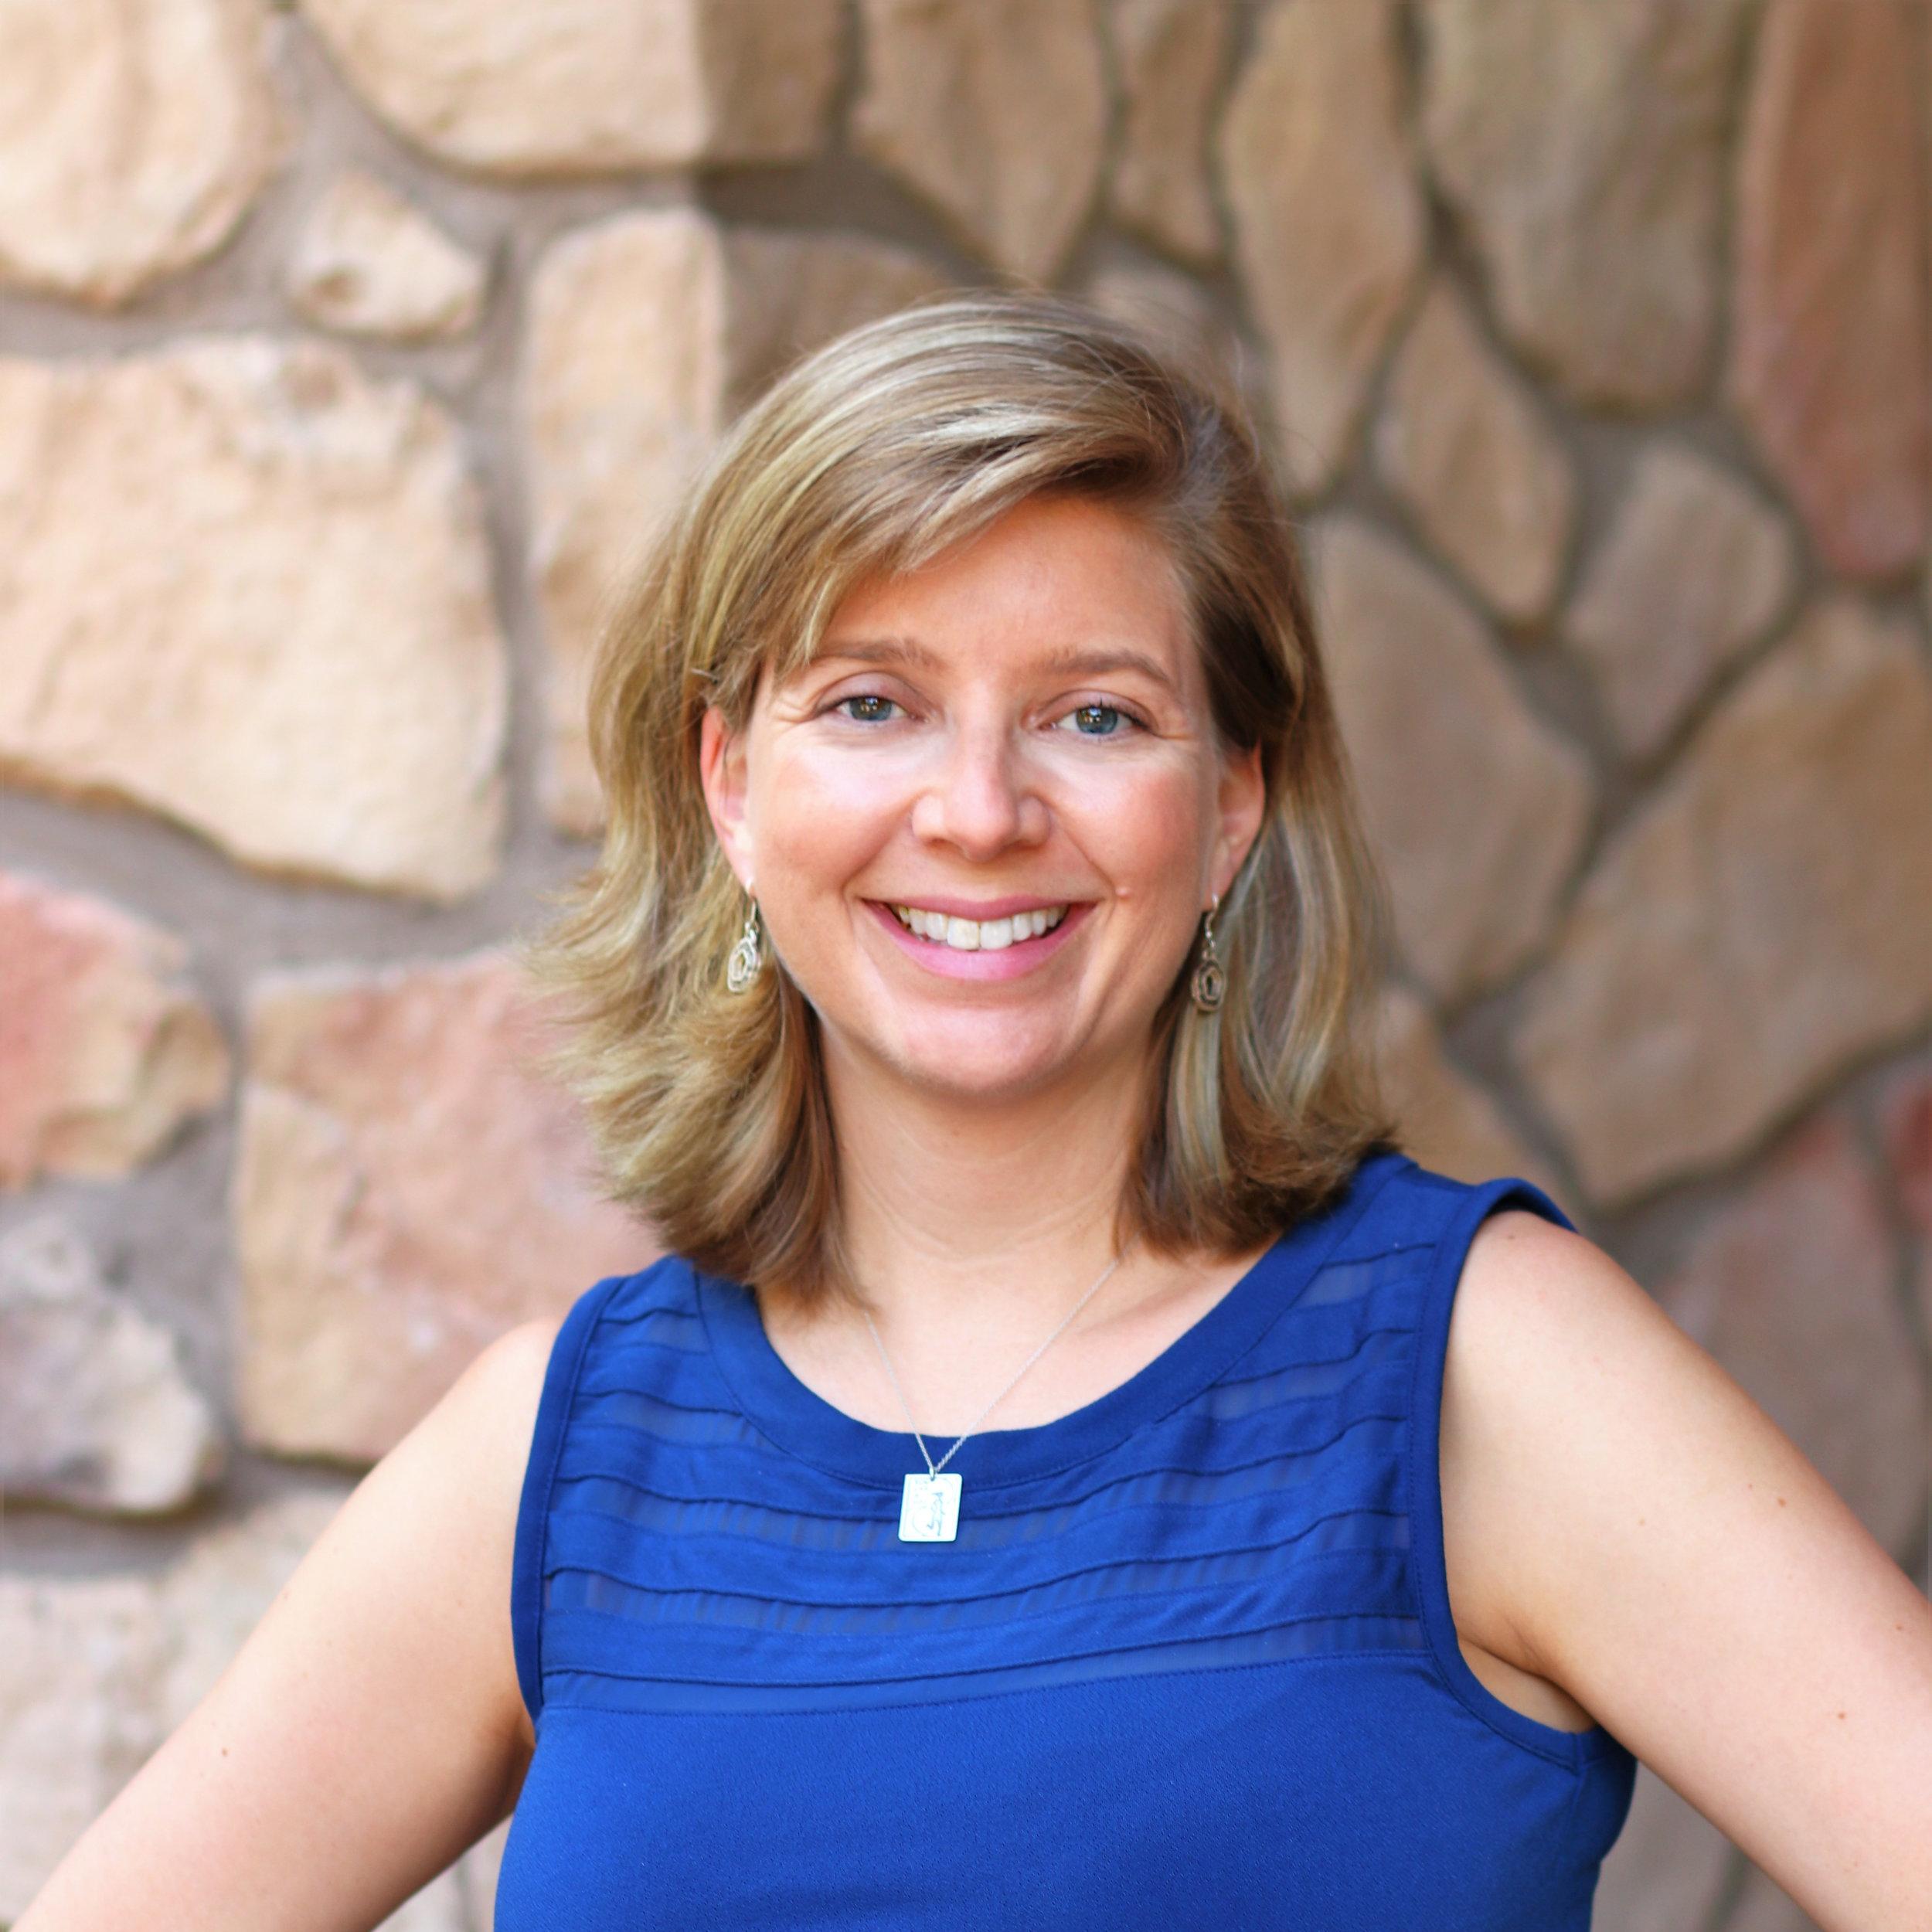 Dr. Kelley Smith - All About Children Pediatrics - 2018.JPG